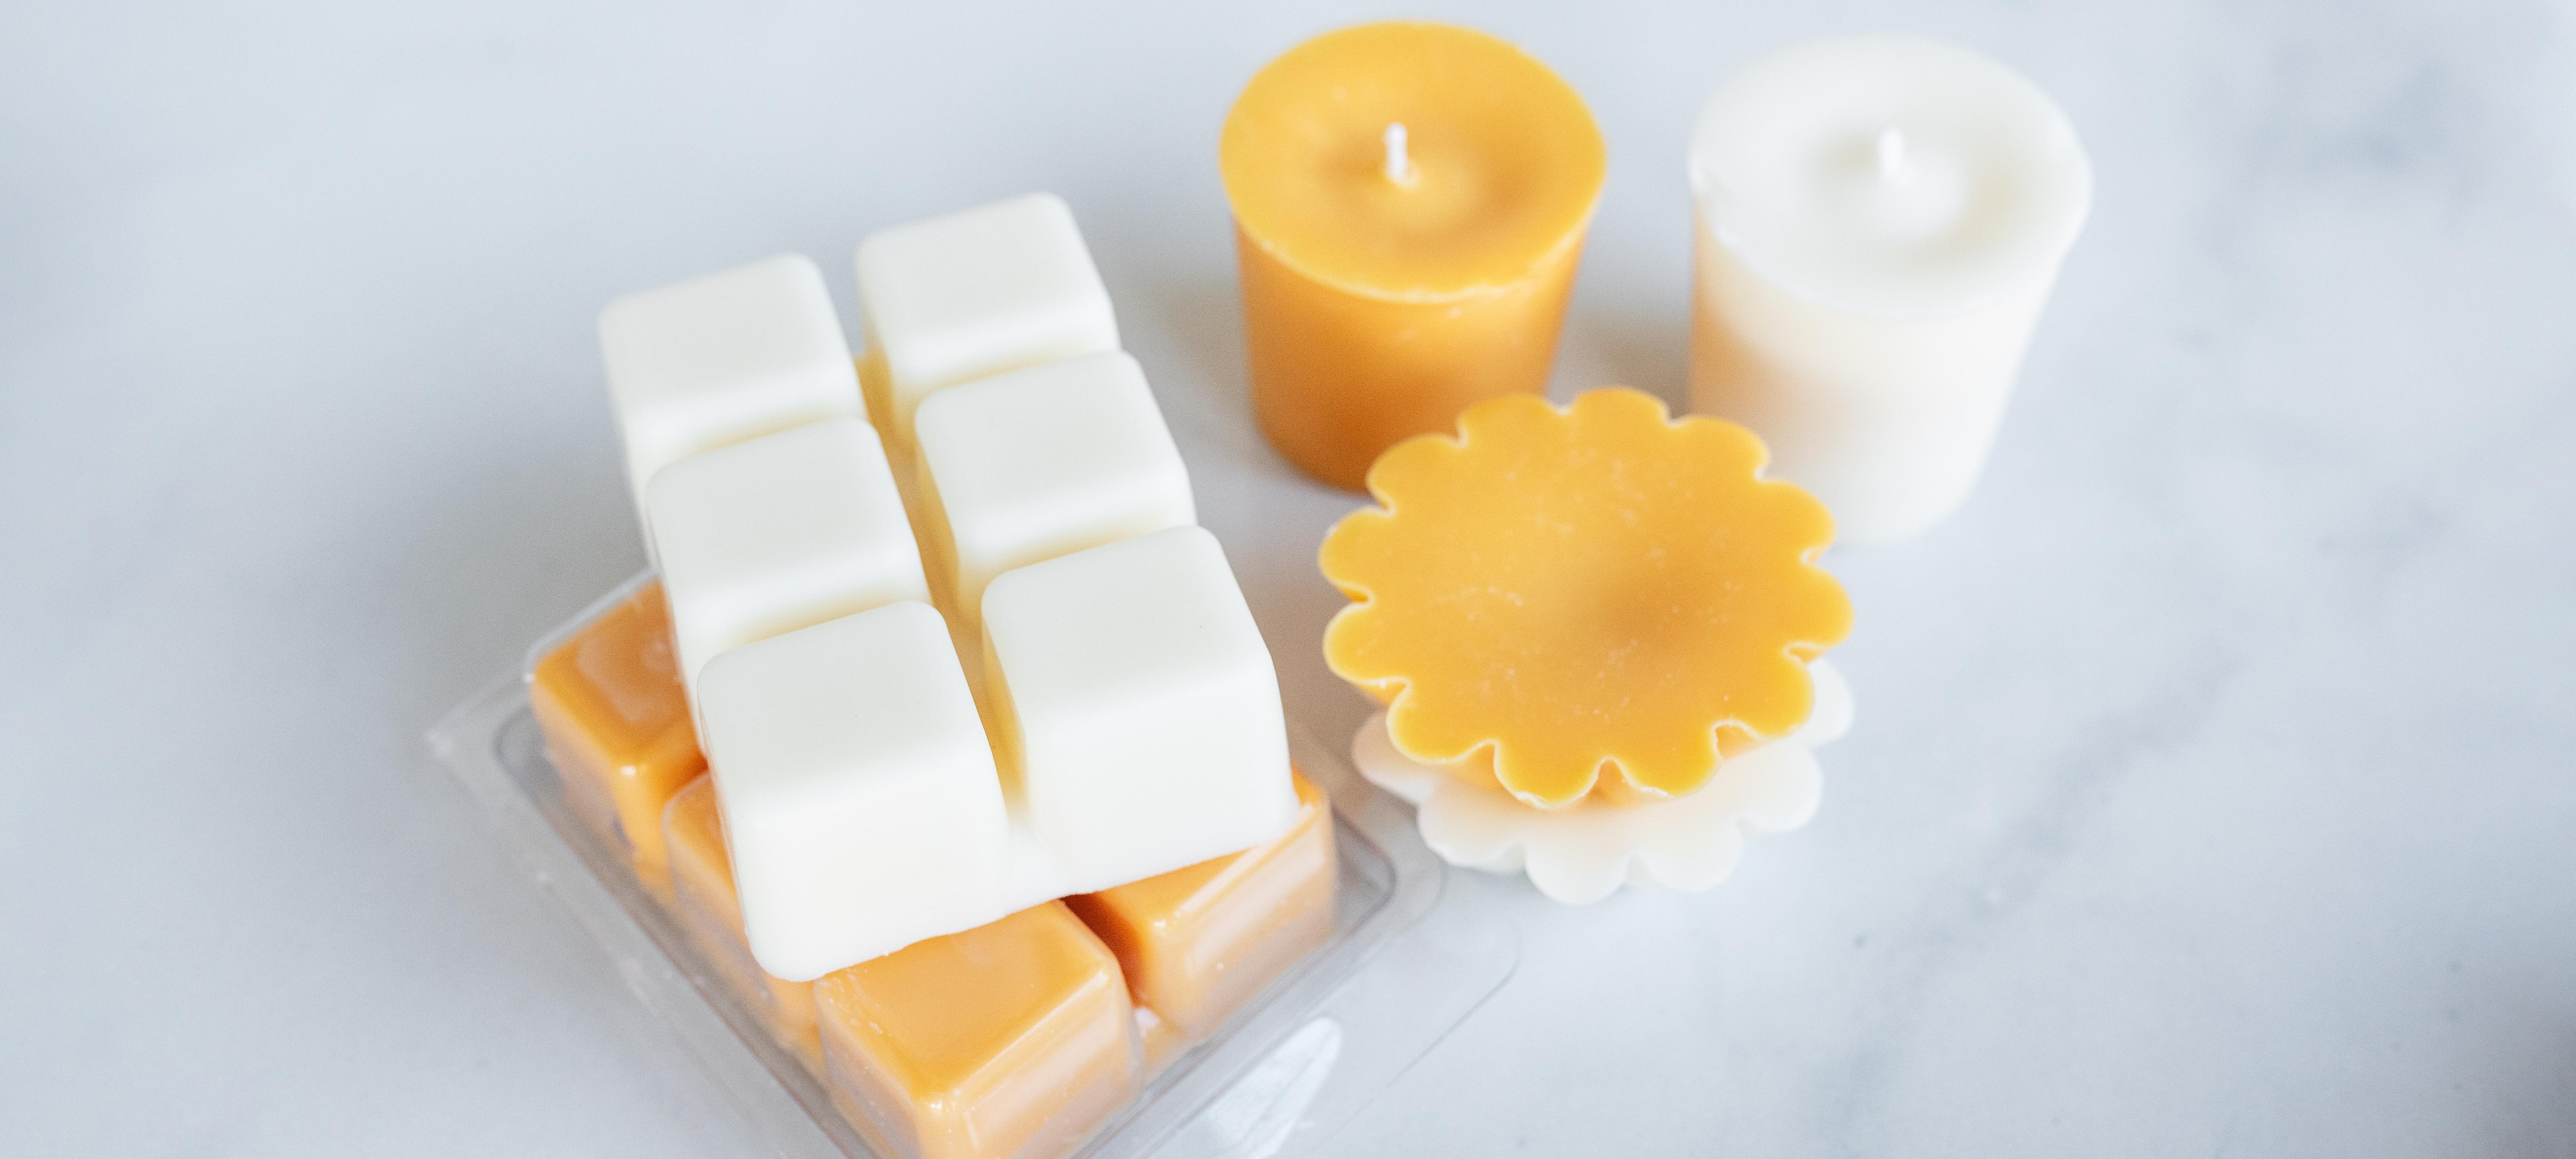 Soy wax melts, clamshells, votives, and wax tarts.